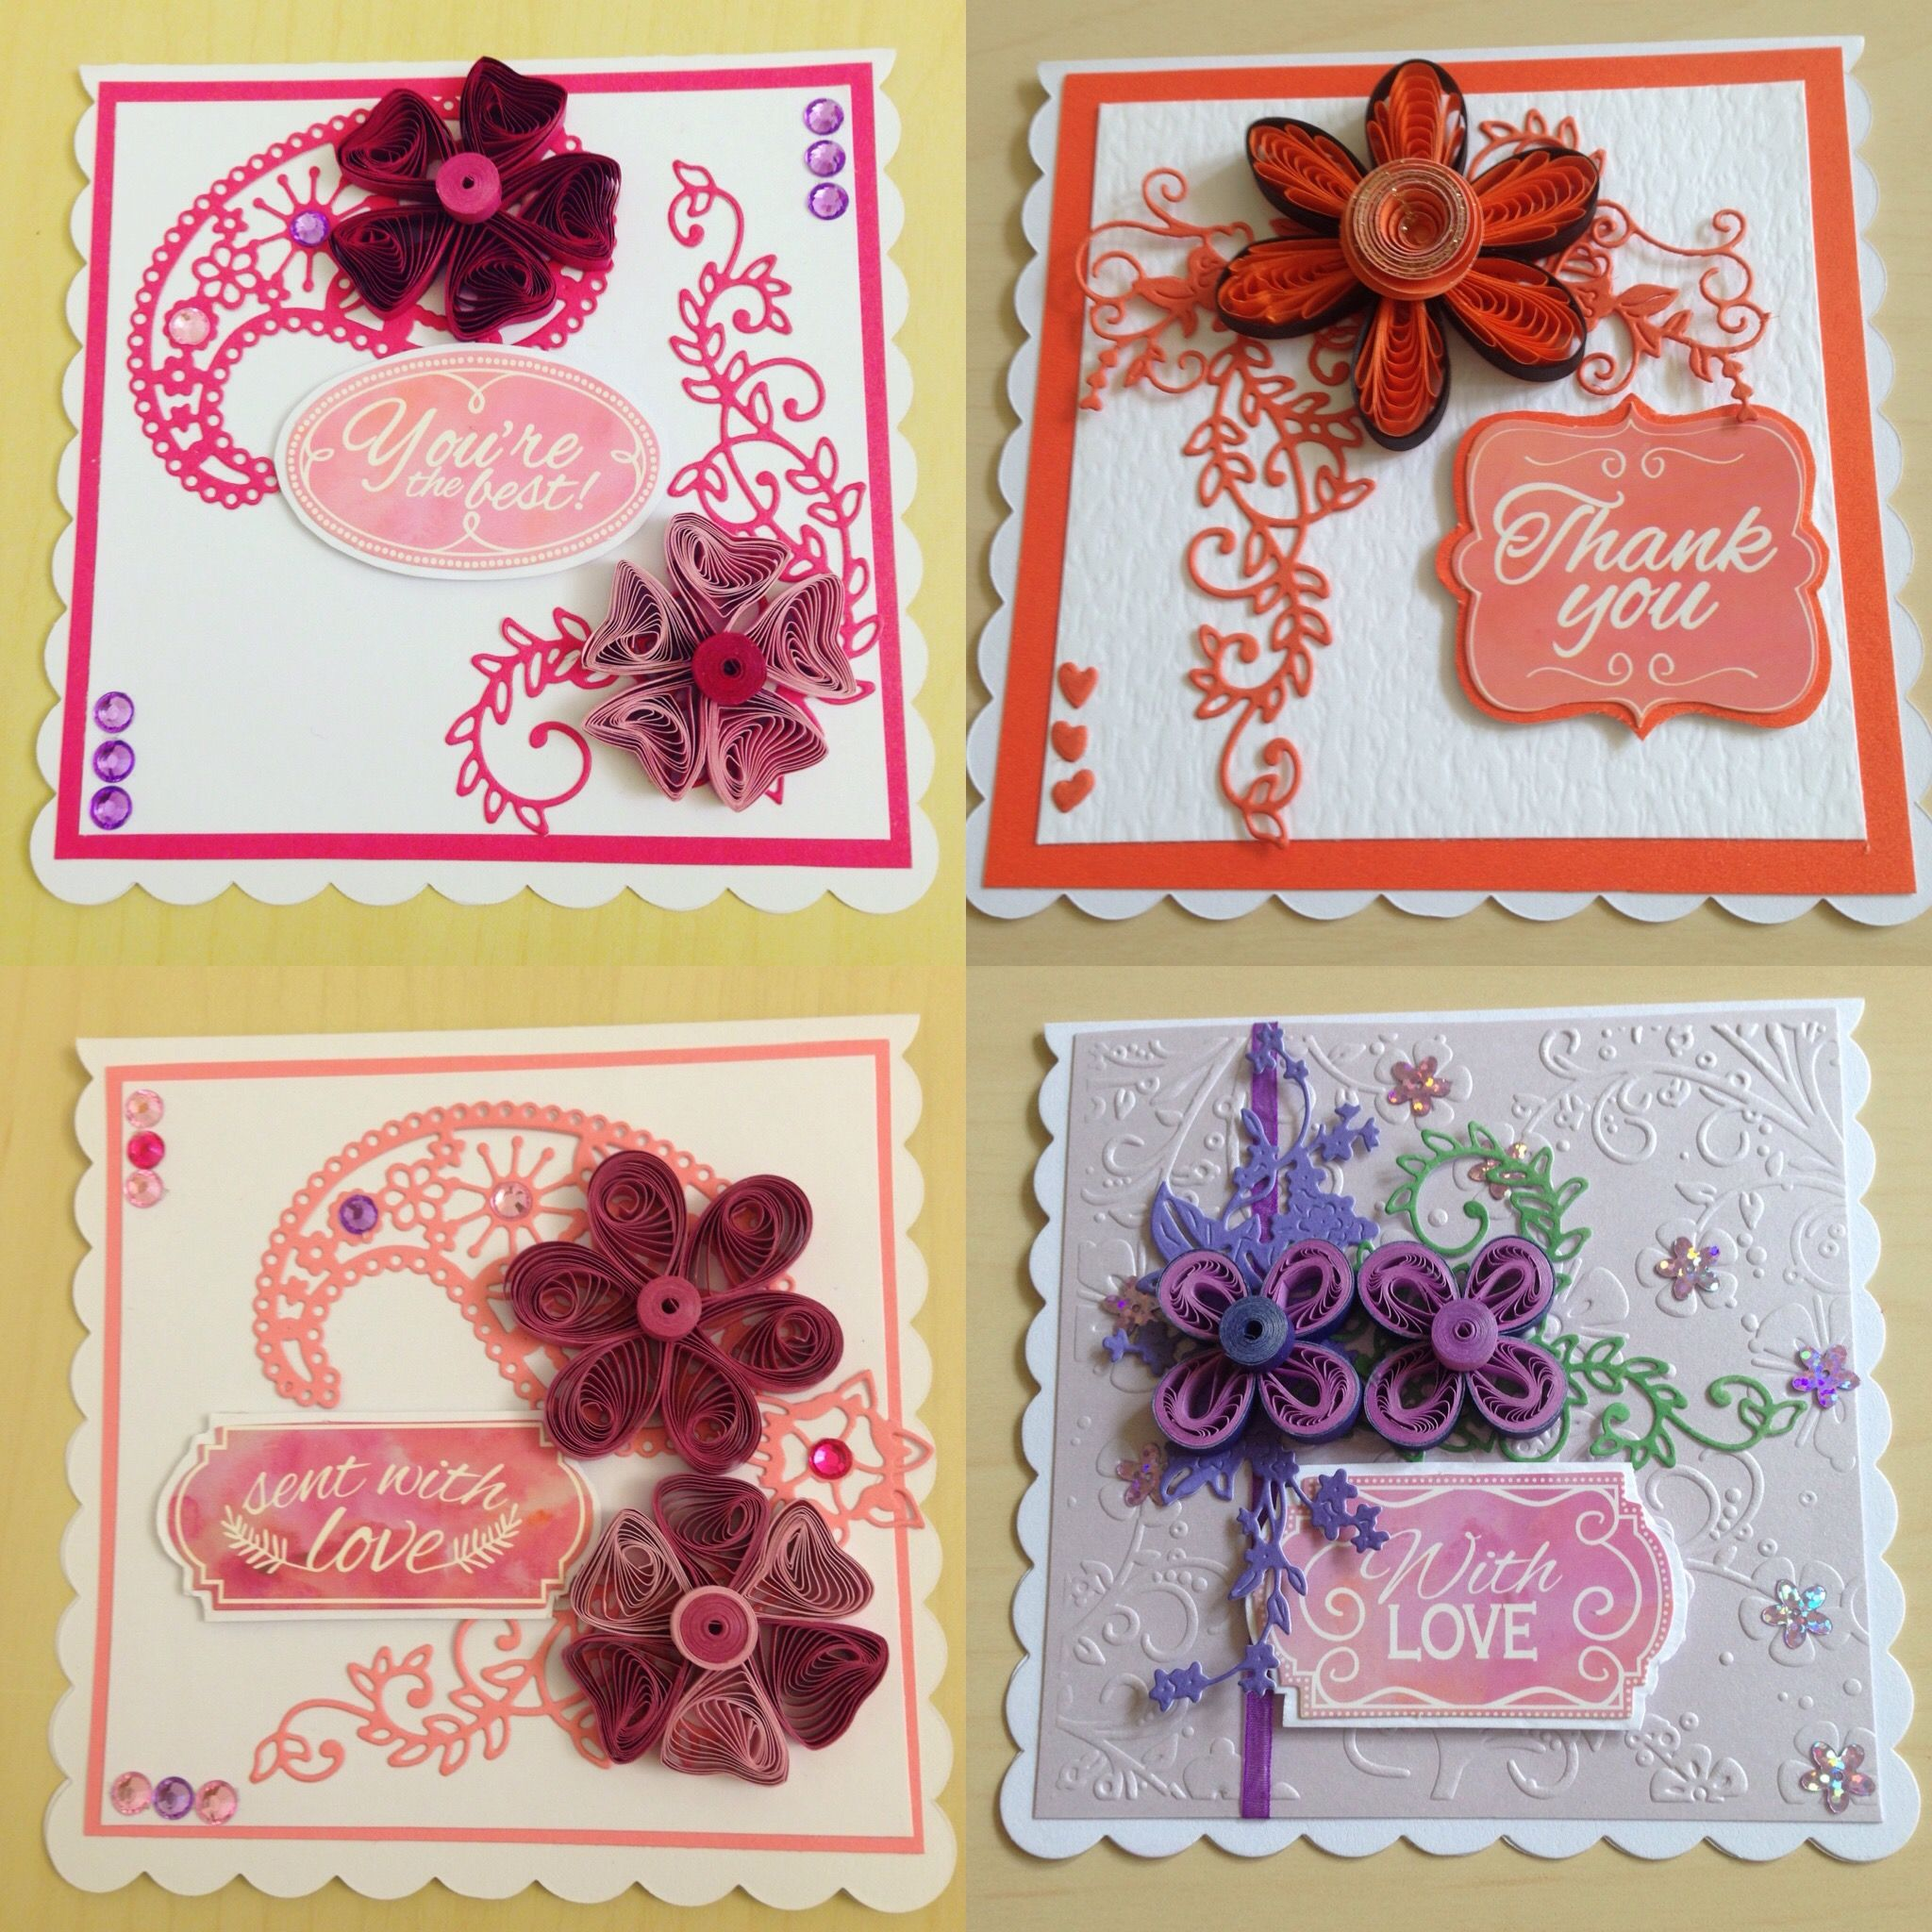 farhat handmade card pm to enquirebuyhandmadecards